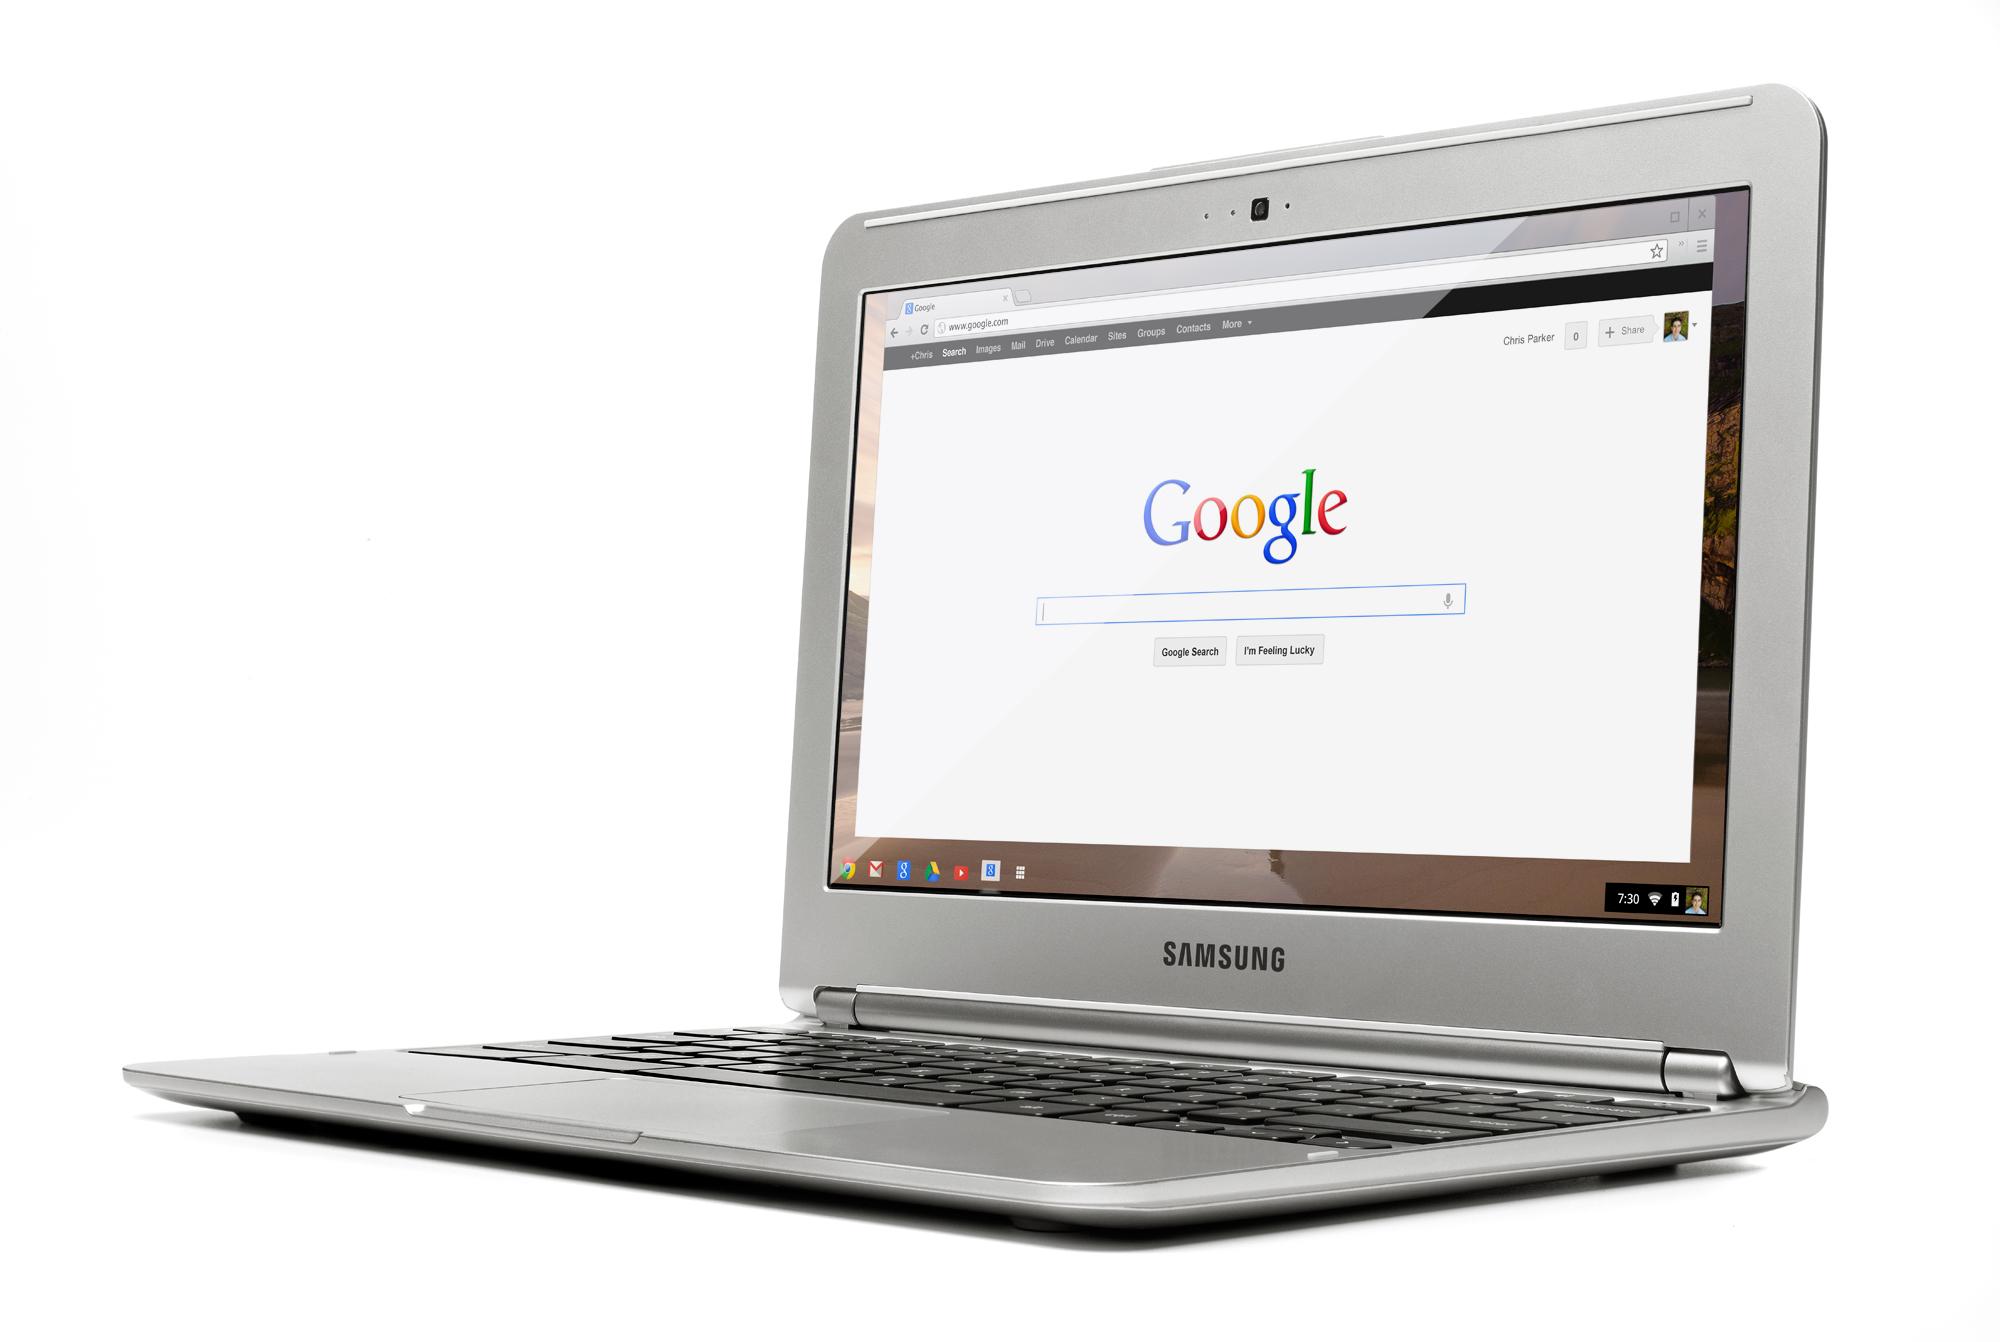 Samsungin Series 3 Chromebook 303C